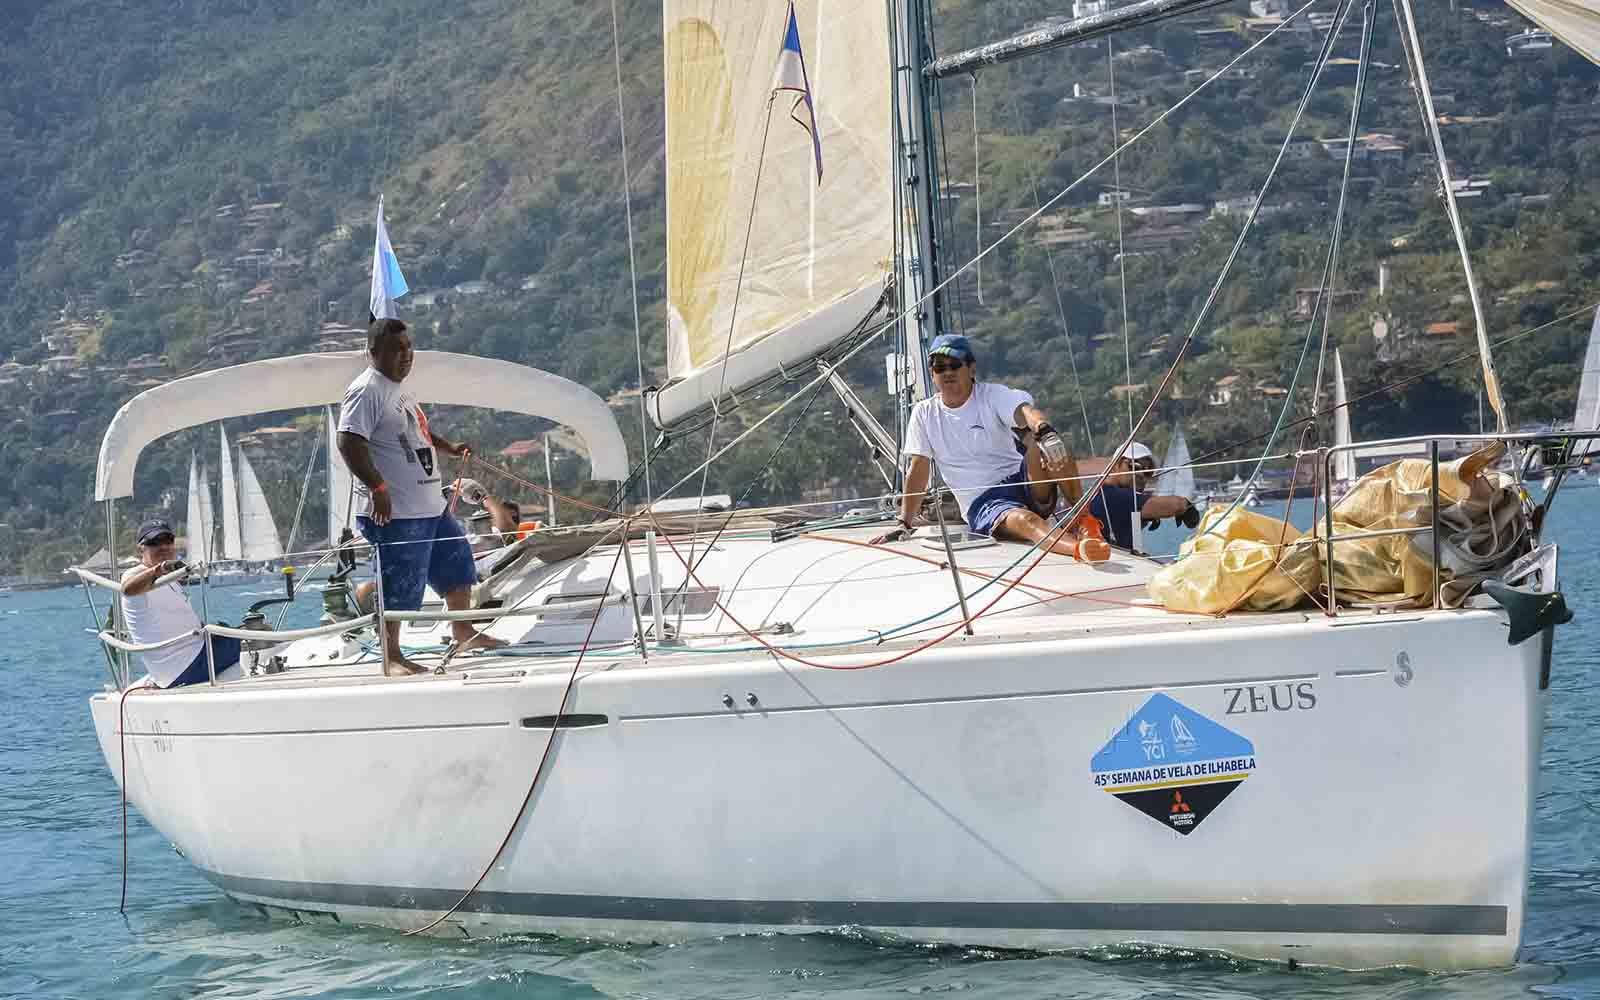 zeus Semana Internacional de Vela de Ilhabela - boat shopping